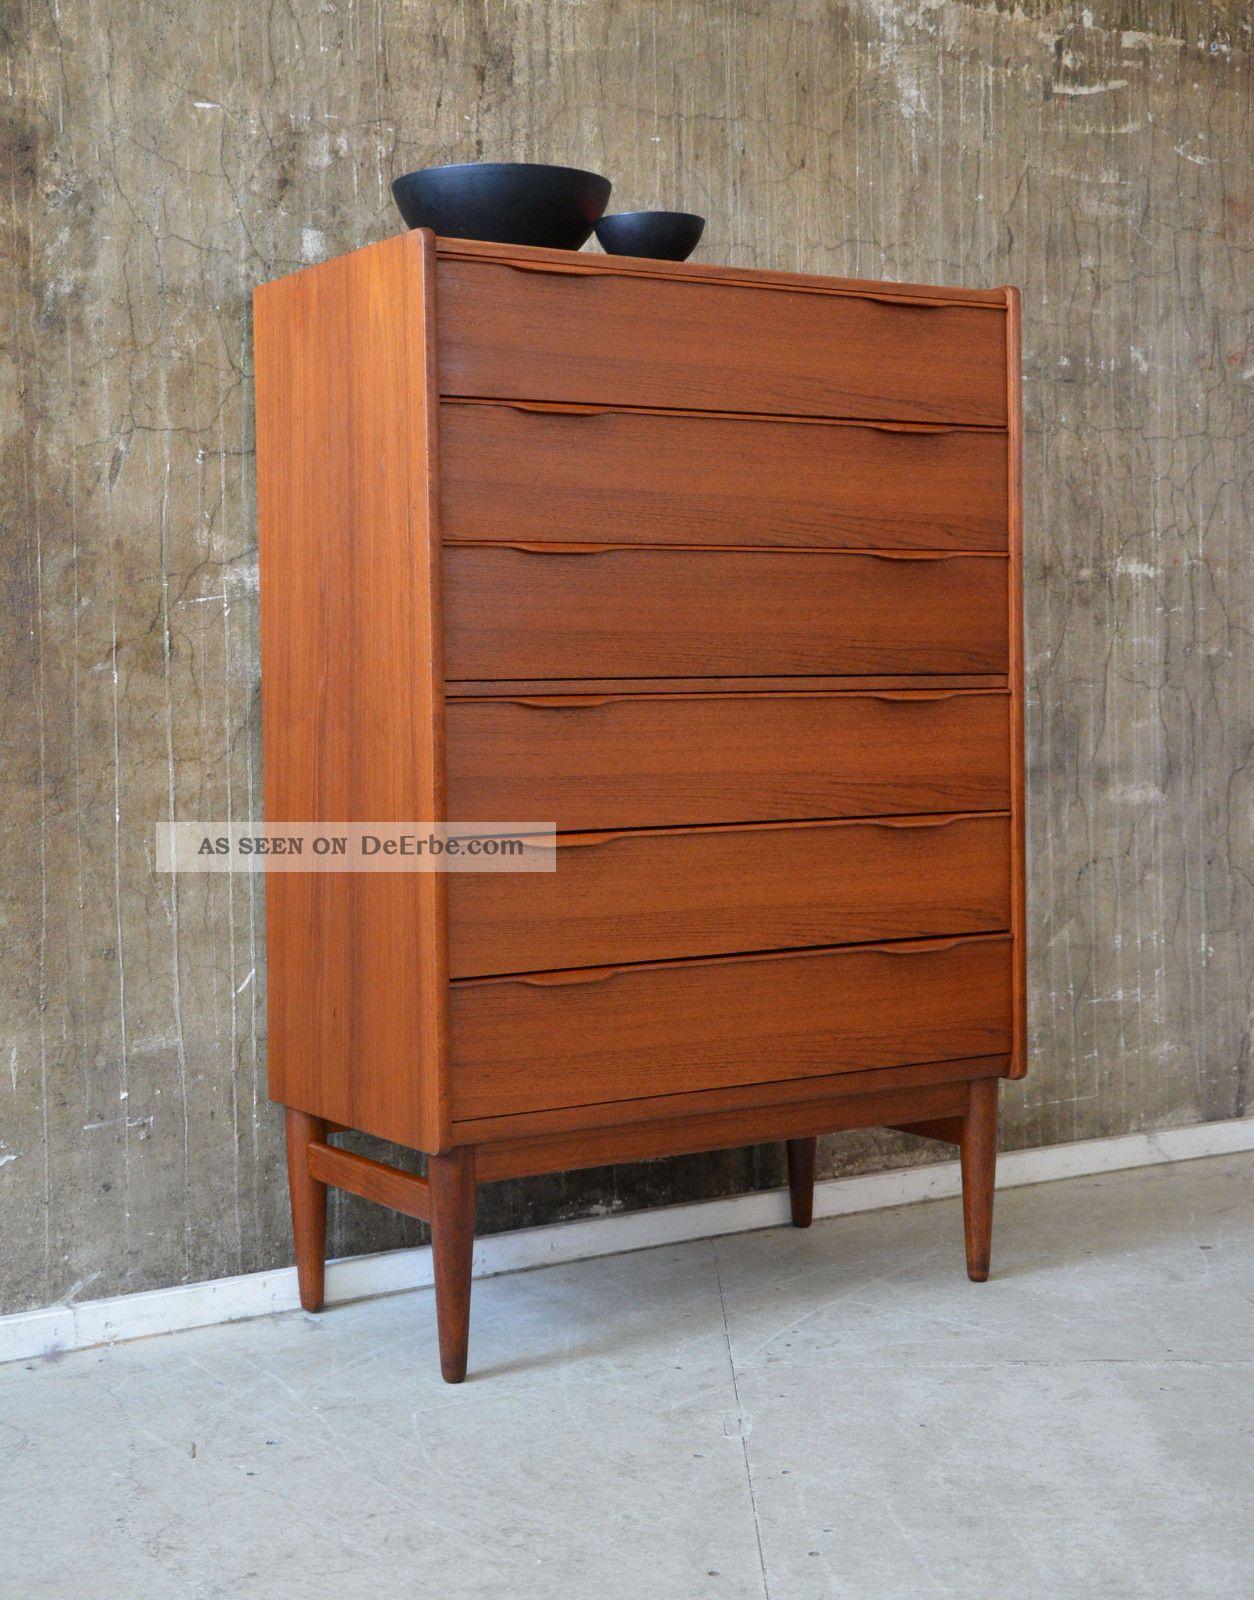 60er teak kommode highboard danish design 60s cabinet